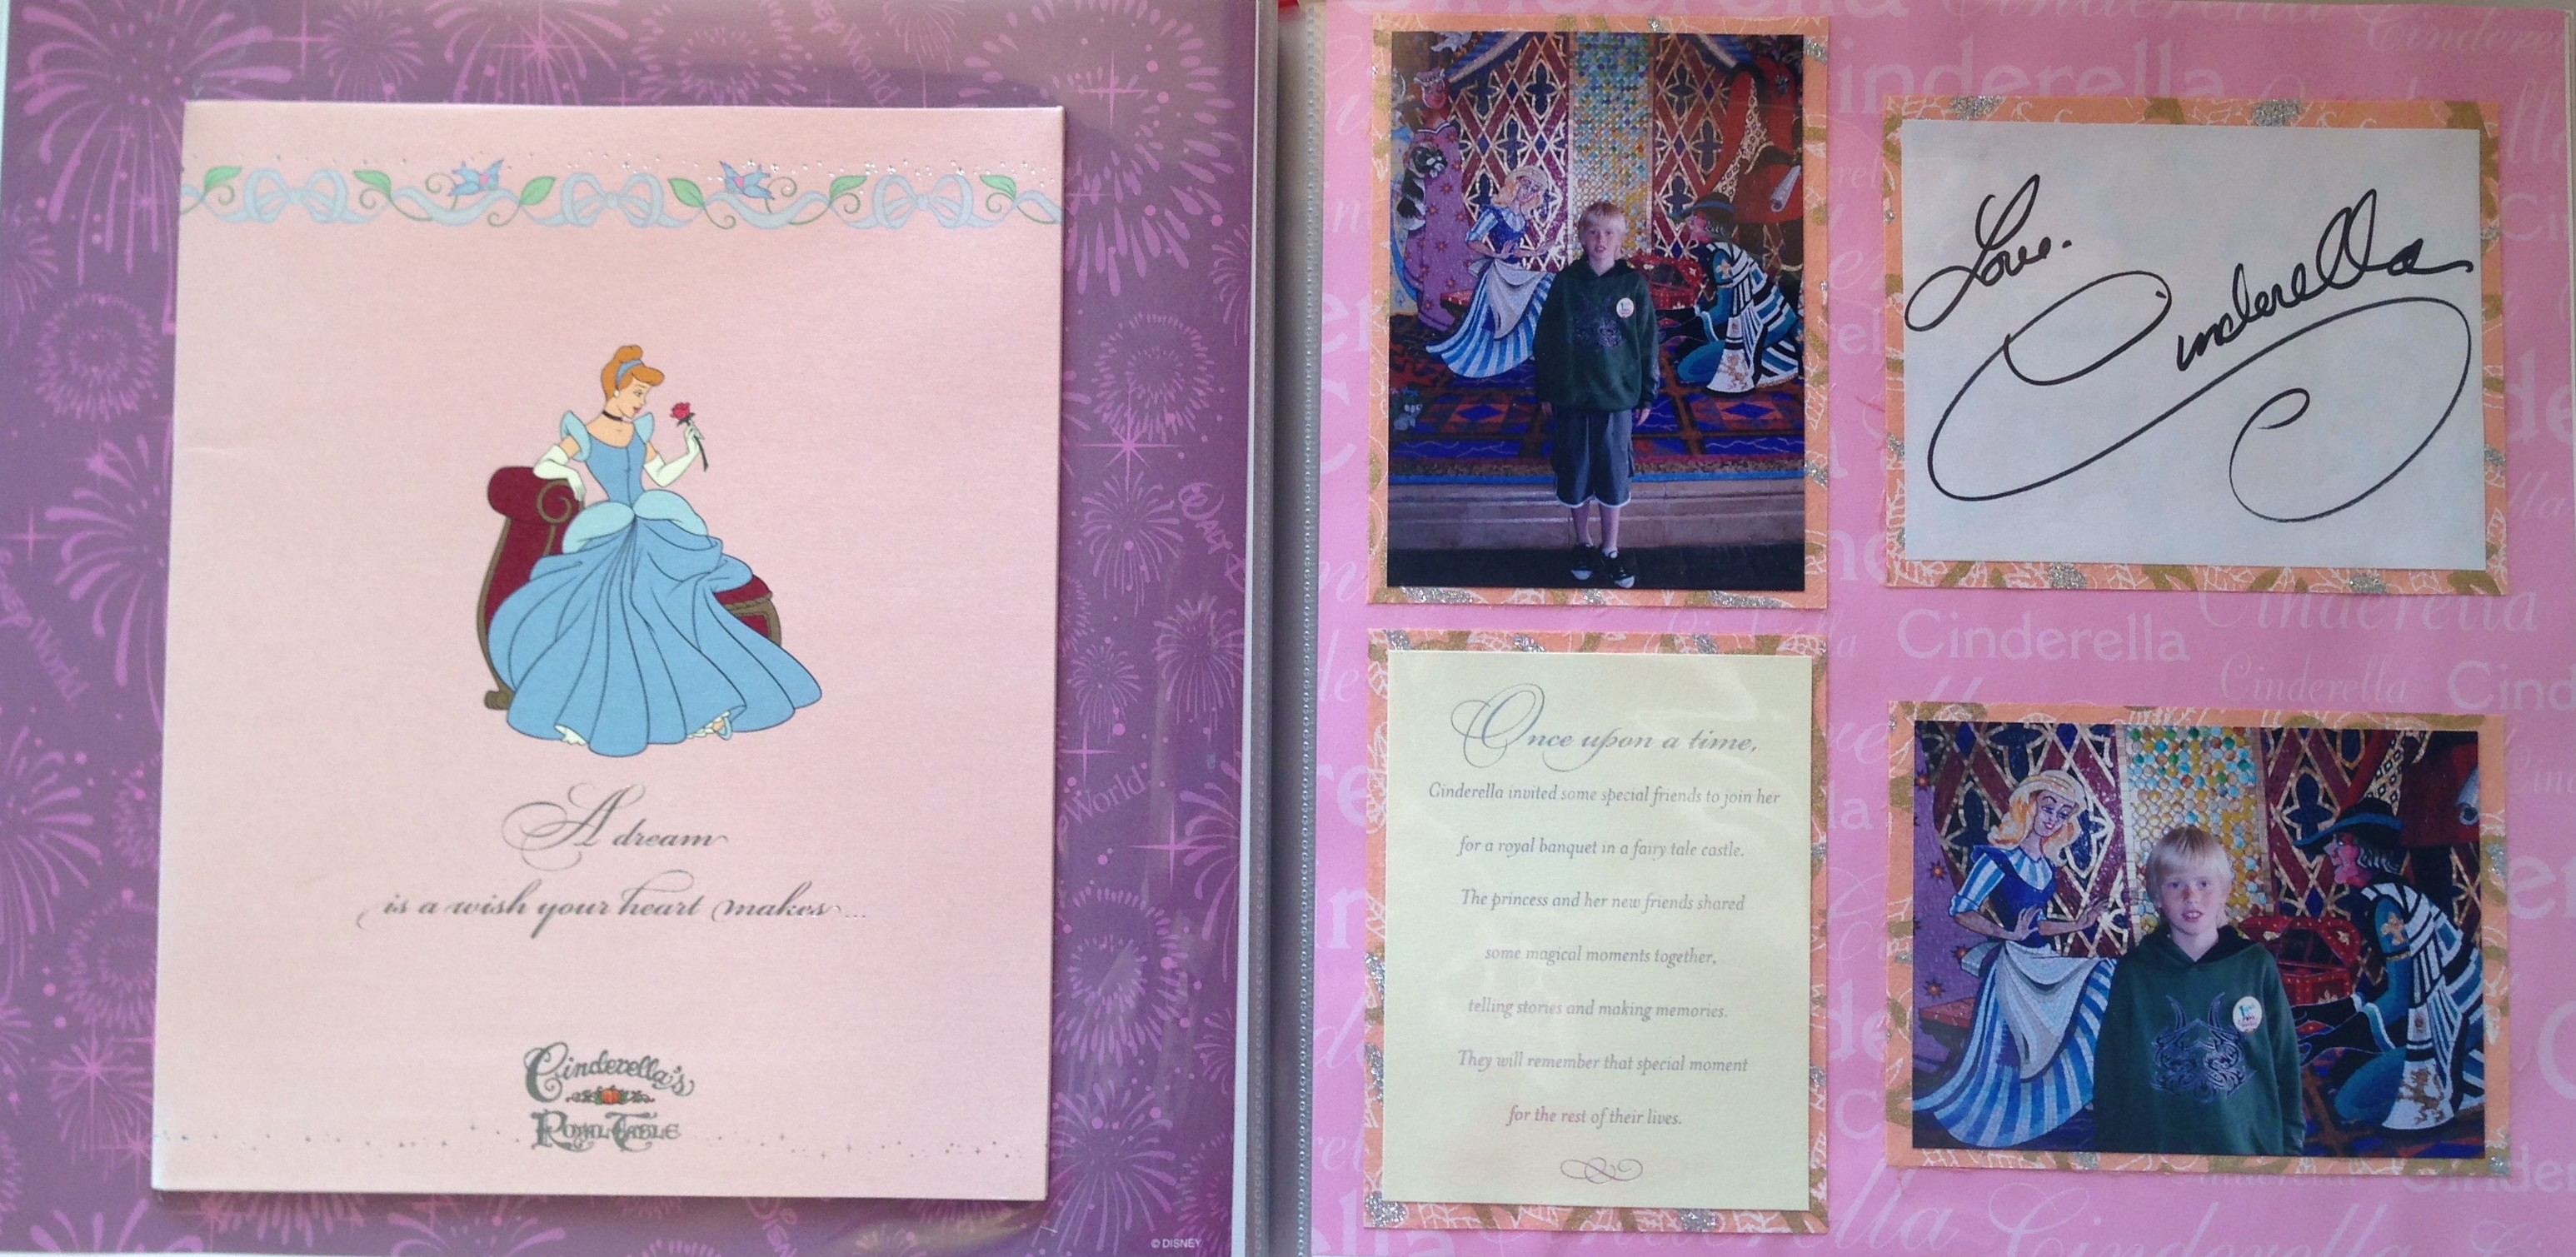 How to scrapbook disney vacation - Disney Vacation 2008 Magic Kingdom Cinderella S Royal Table 1